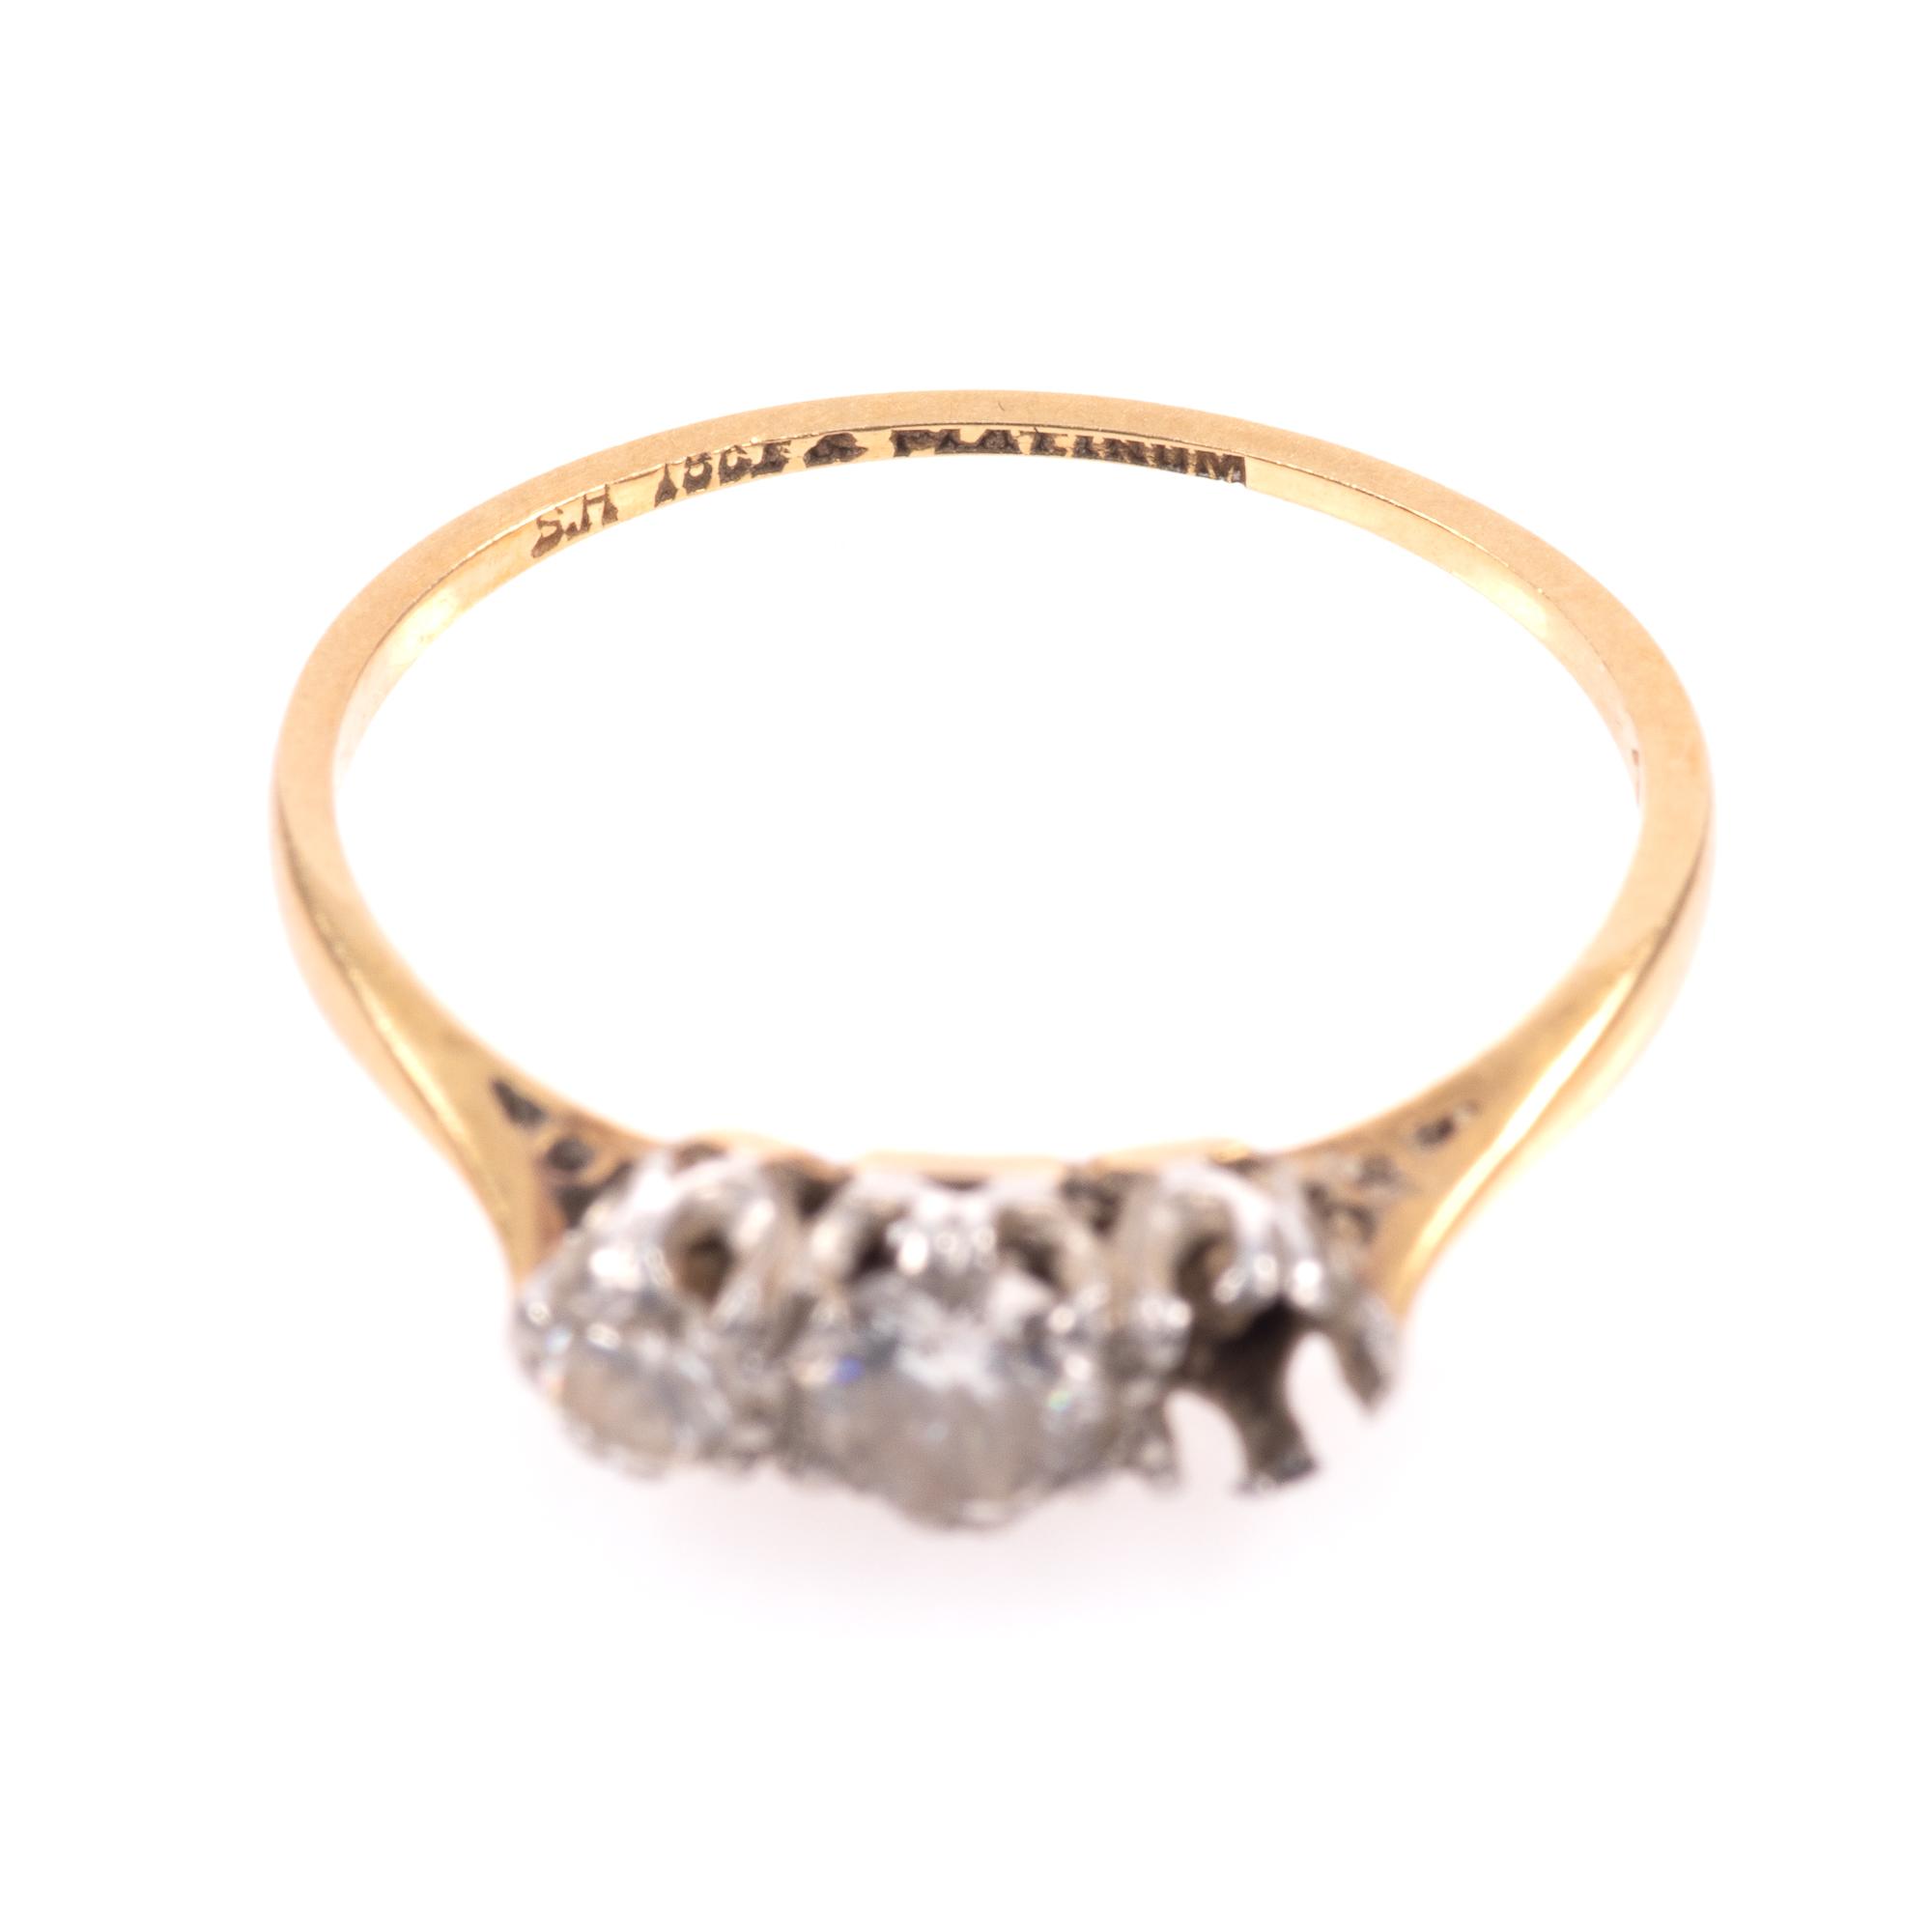 18ct Gold & Platinum 0.40ct Diamond Ring - Image 4 of 8